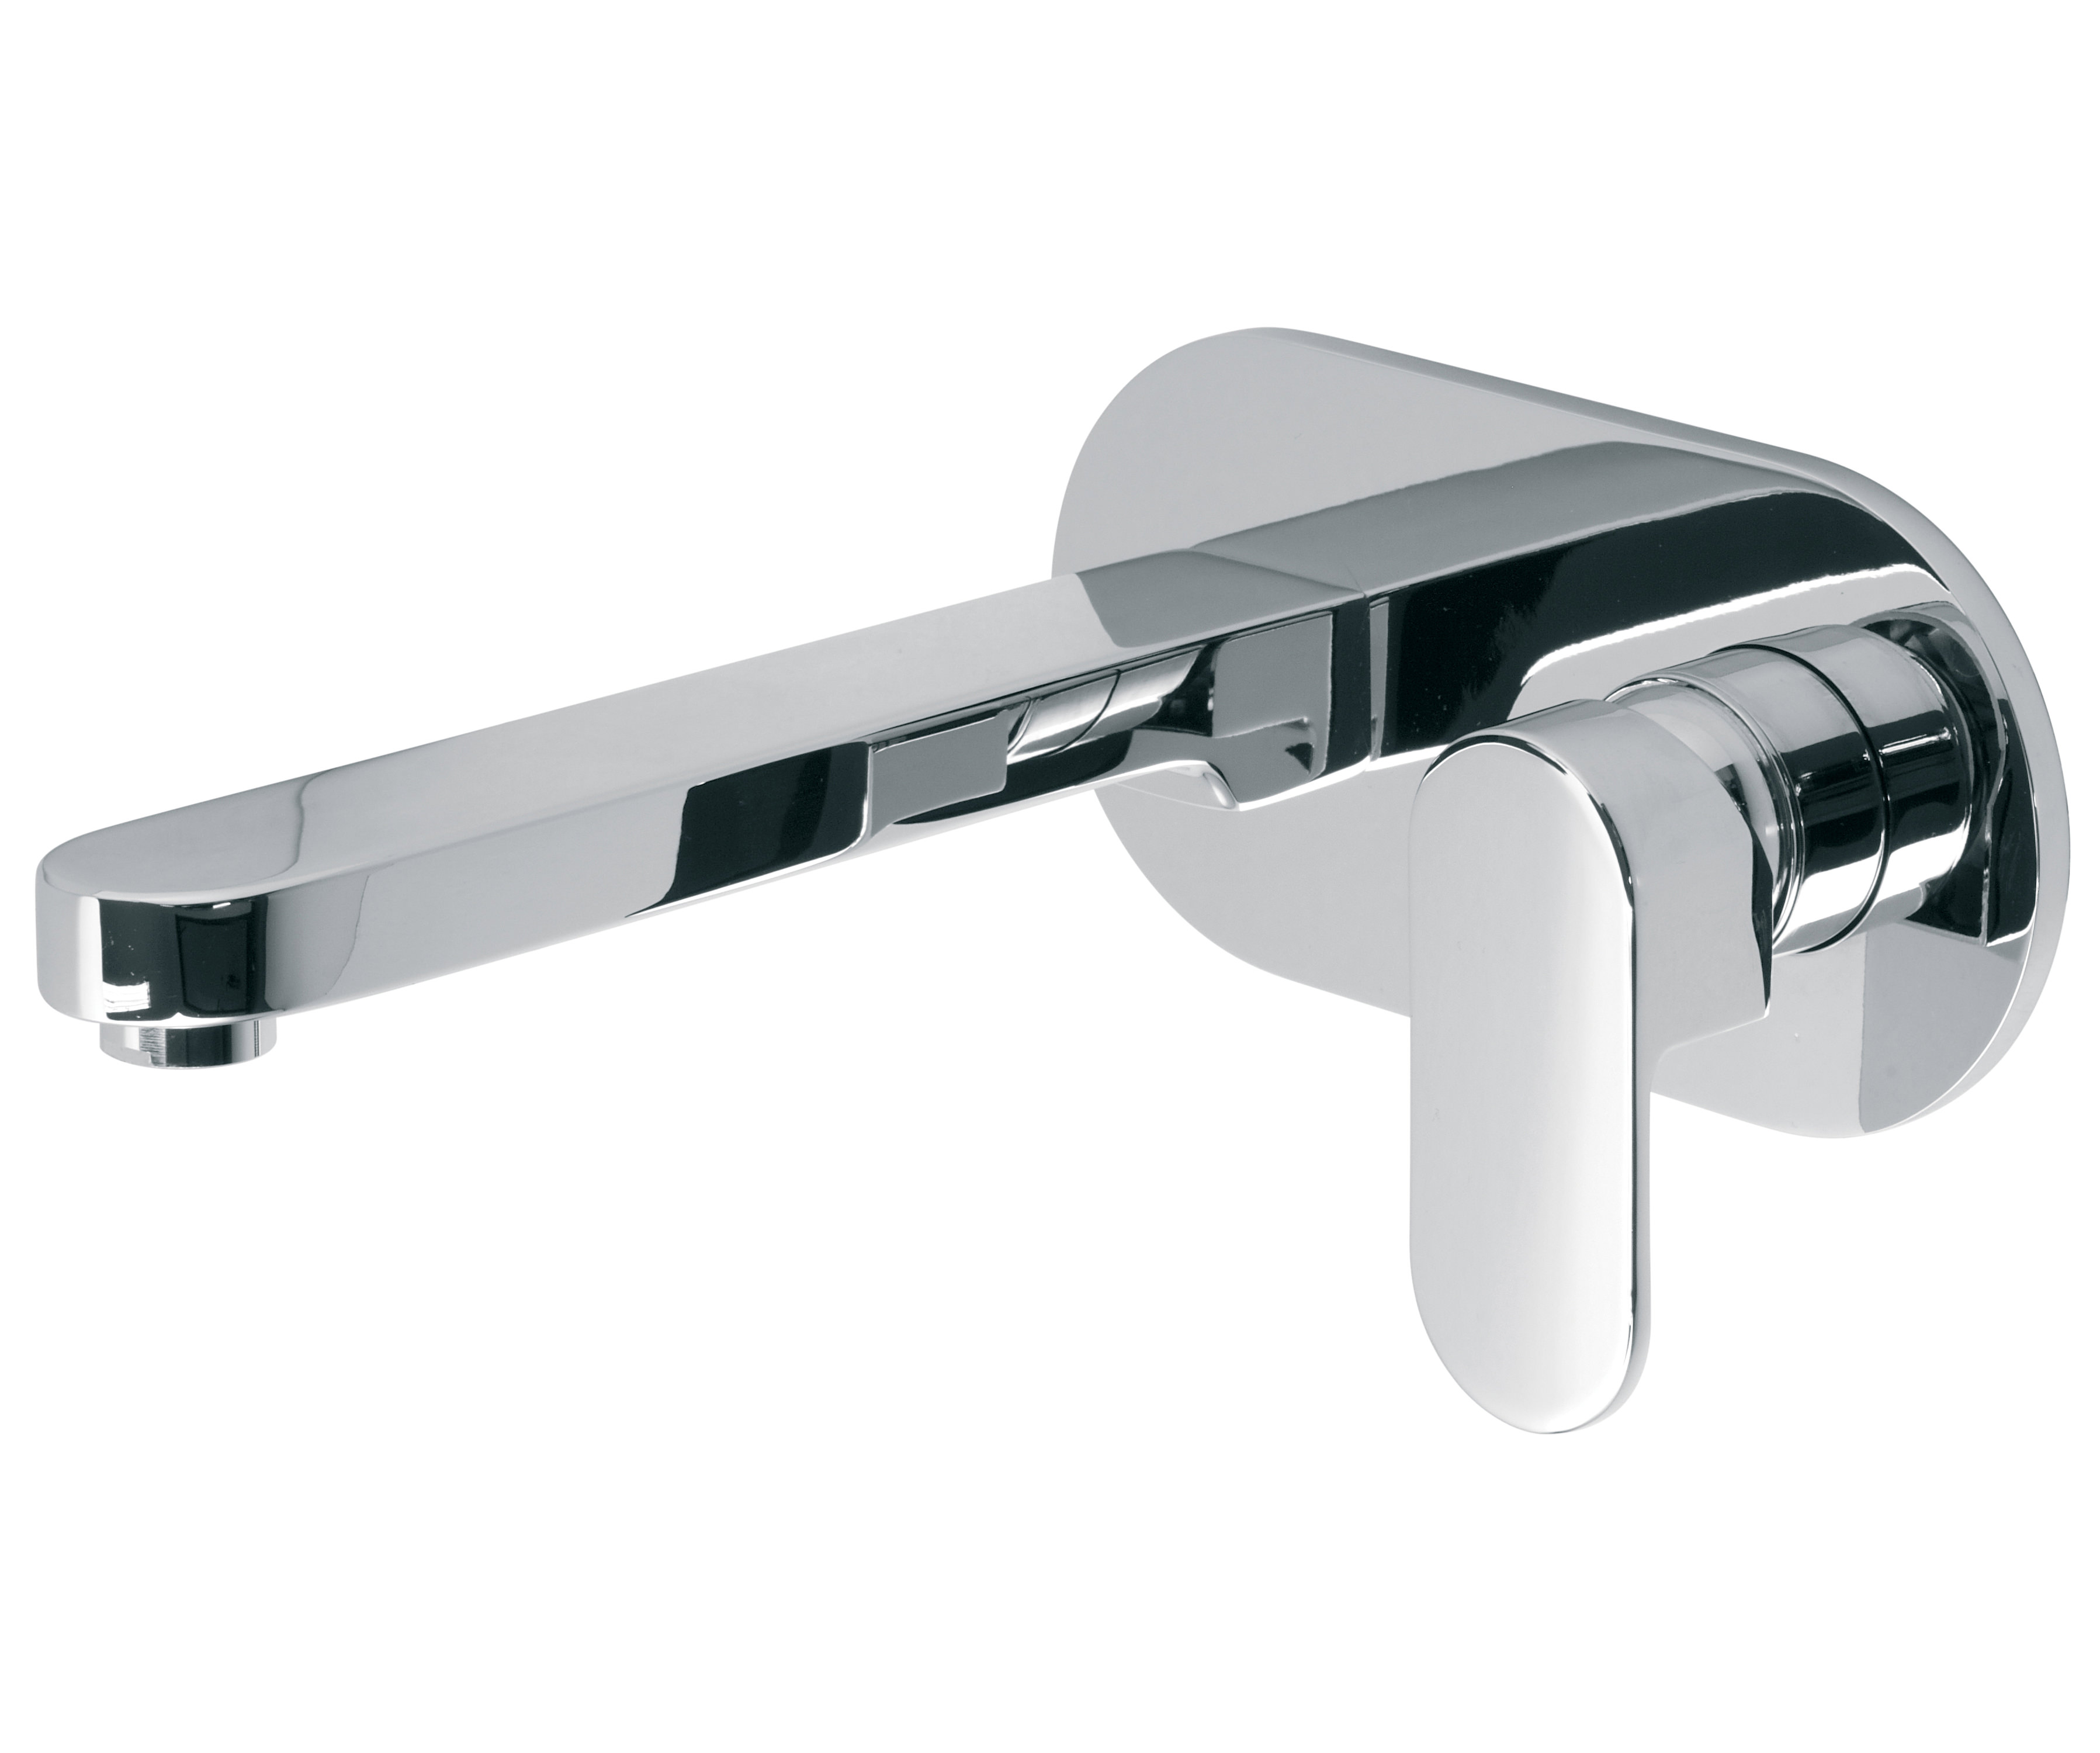 vado life wall mounted single lever basin mixer tap. Black Bedroom Furniture Sets. Home Design Ideas